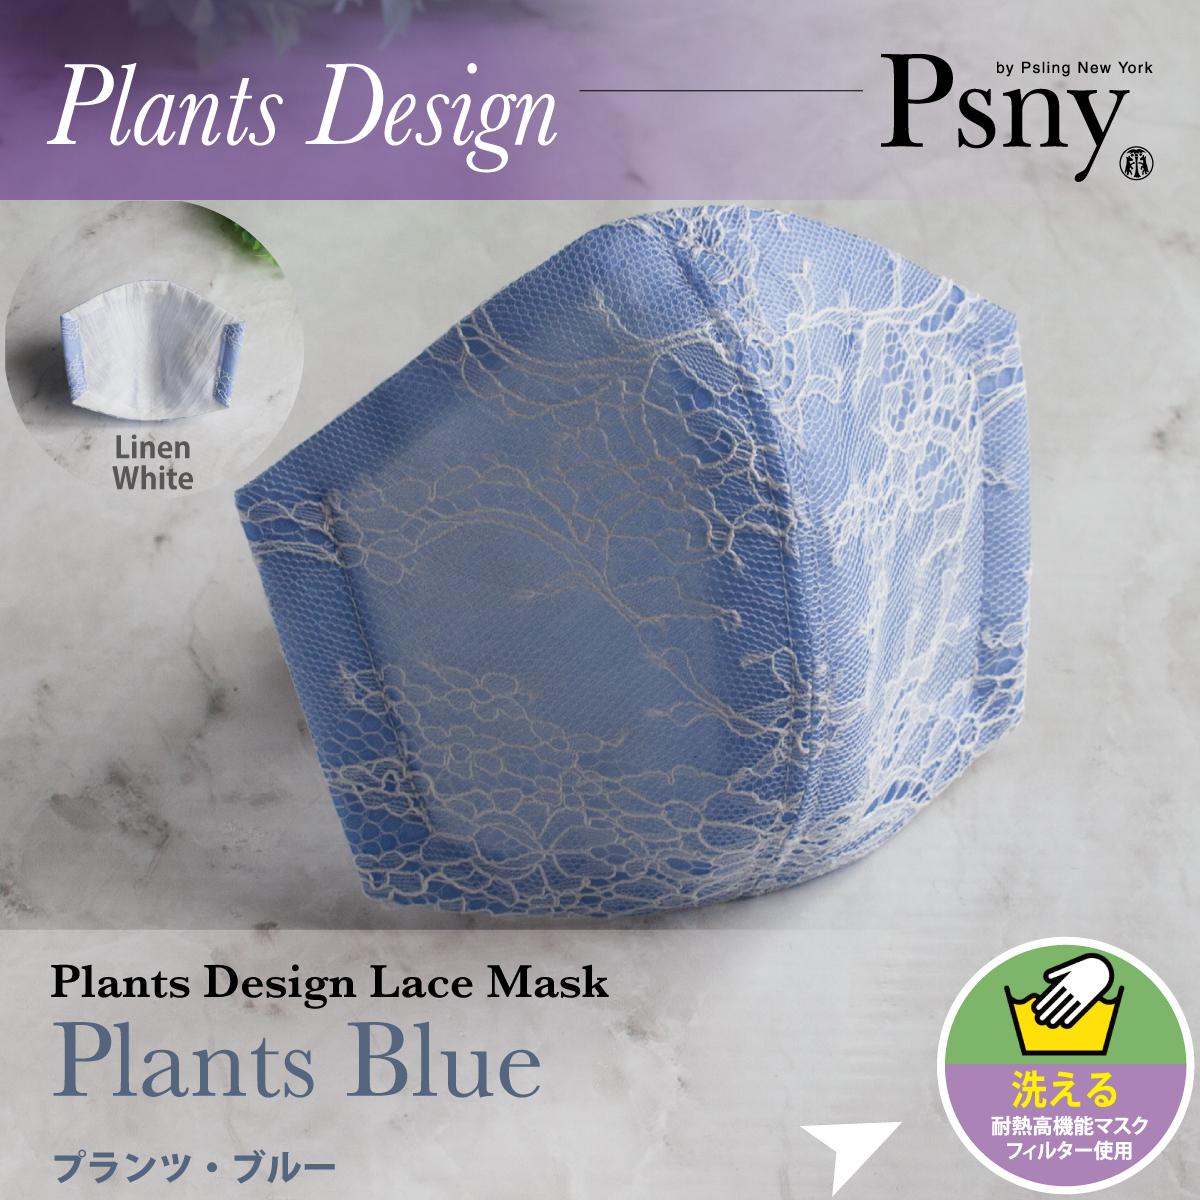 PSNY プランツ レース・ブルー 花粉 黄砂 洗える不織布フィルター入り 立体 大人用 マスク 送料無料 L61